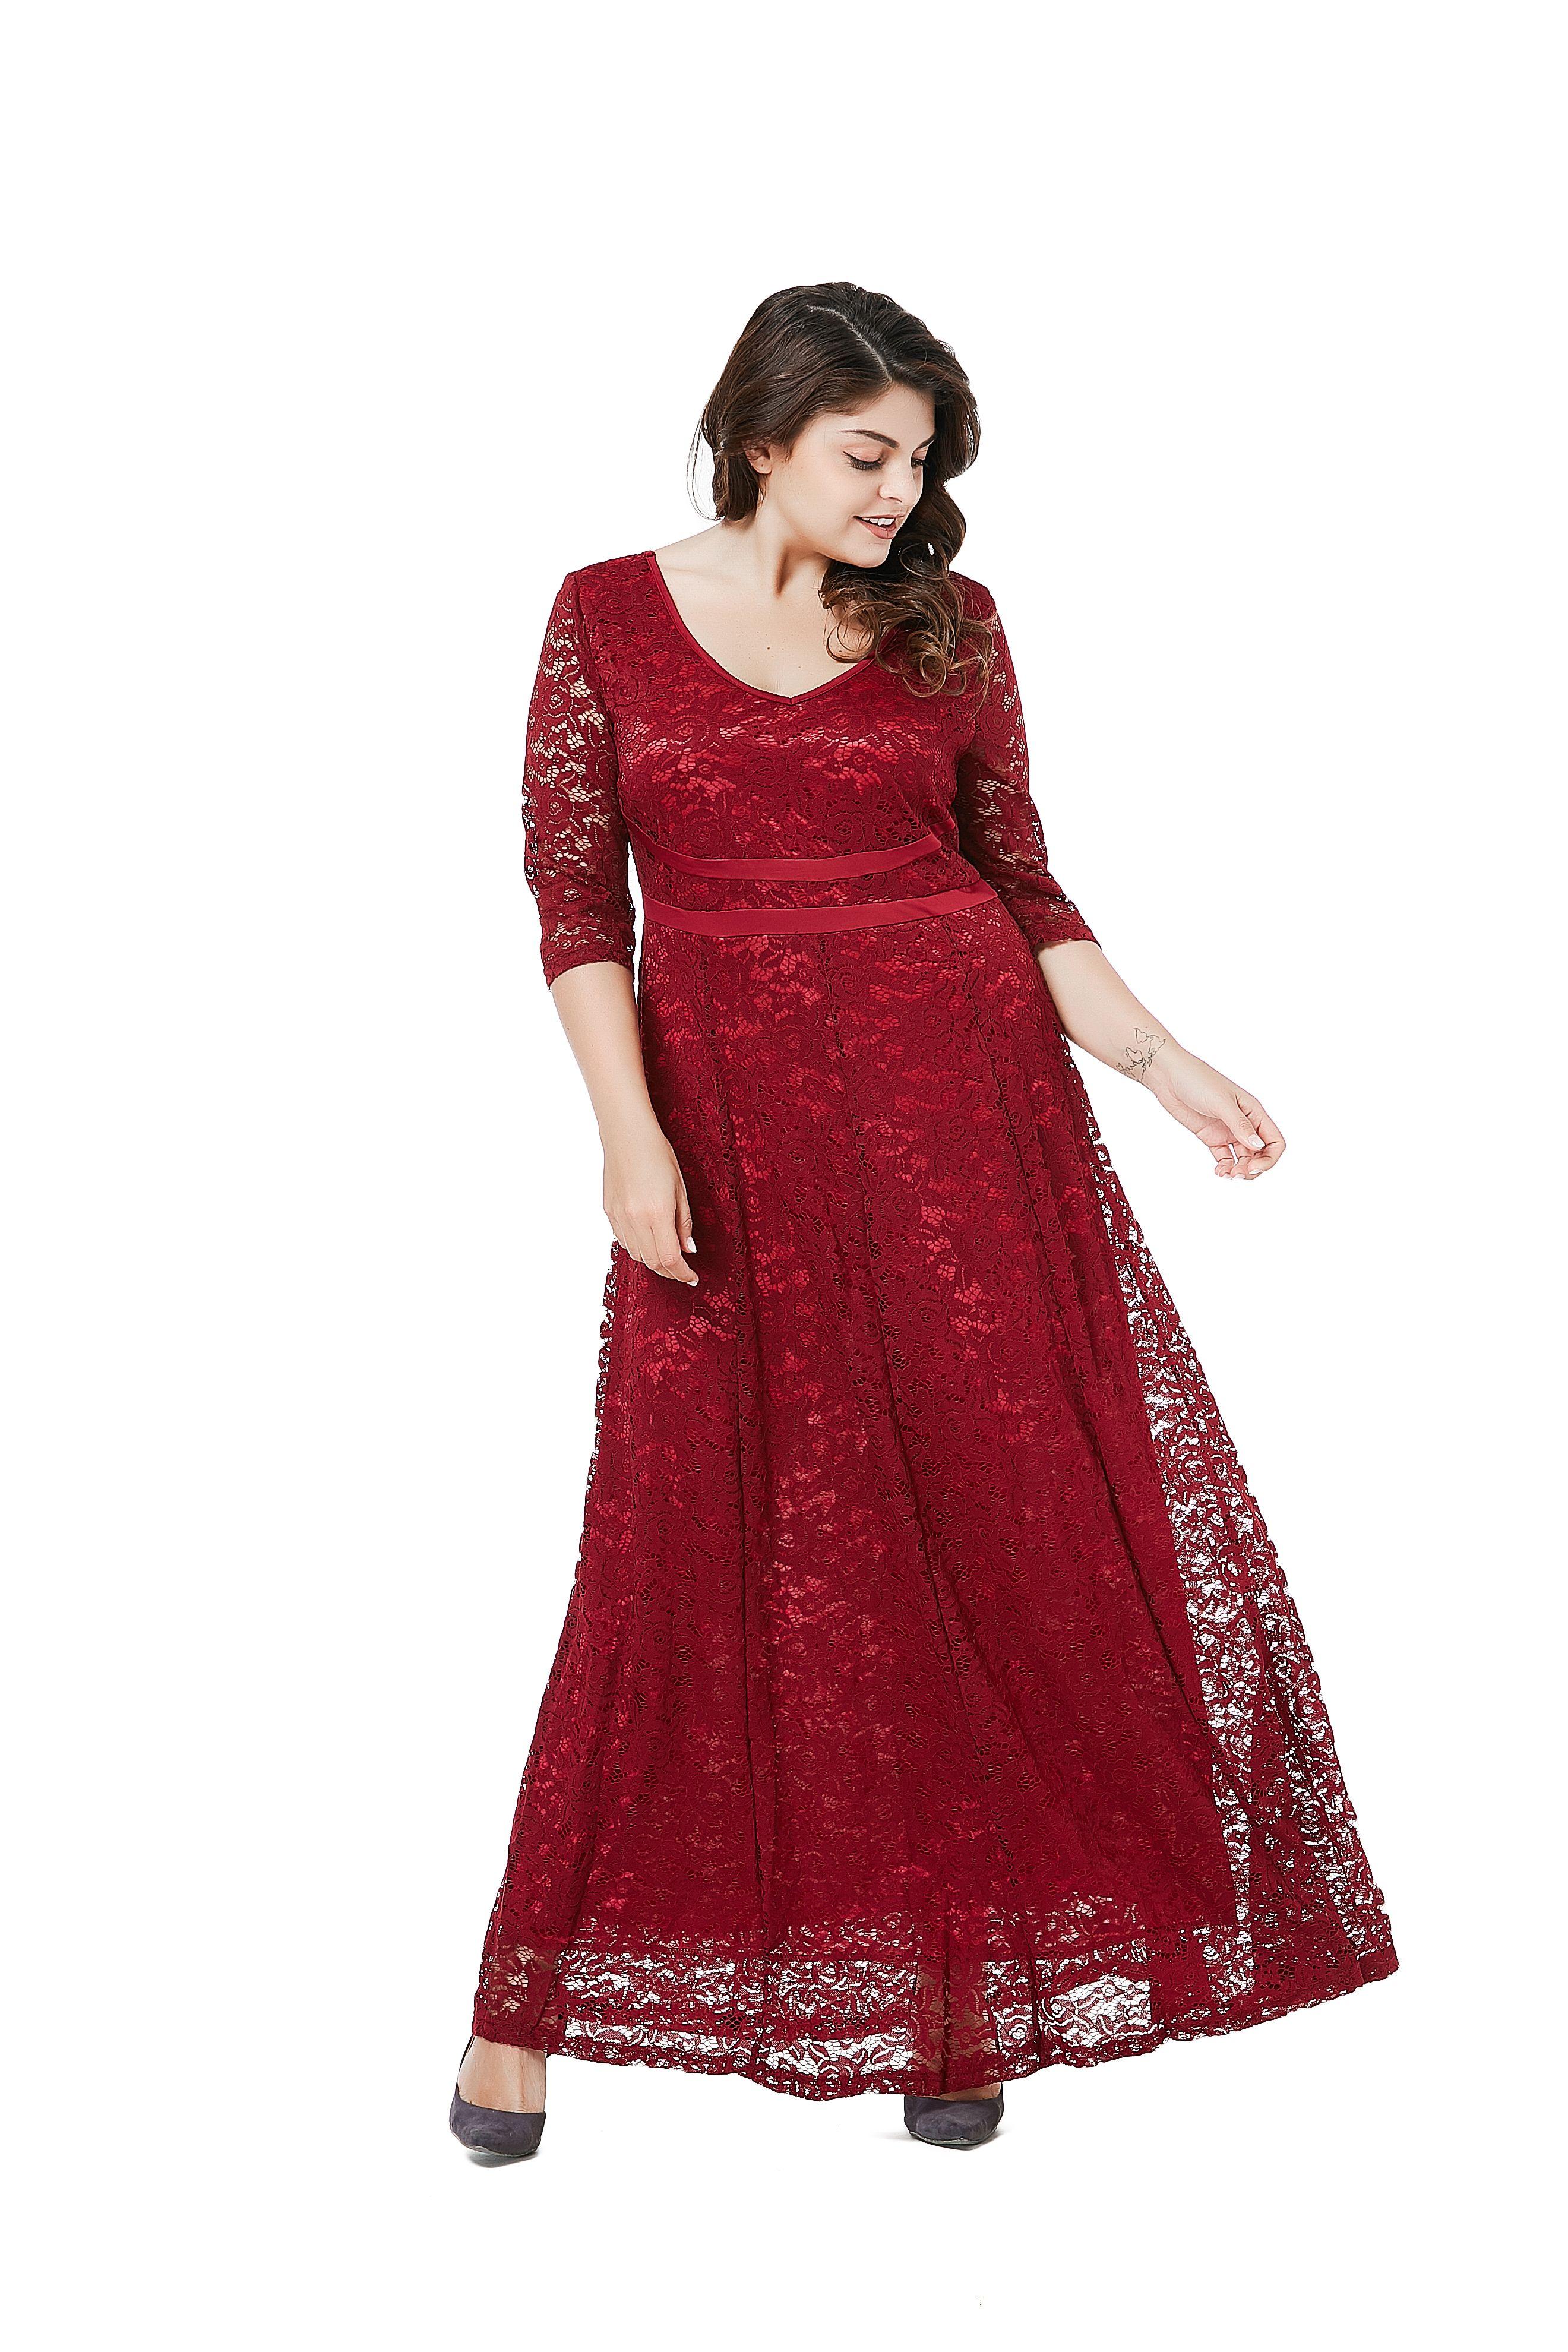 c8b8453bcdc ESPRLIA Women s Plus Size Double V Neck 3 4 Sleeve Dress High Waist Maxi  Wedding Dress